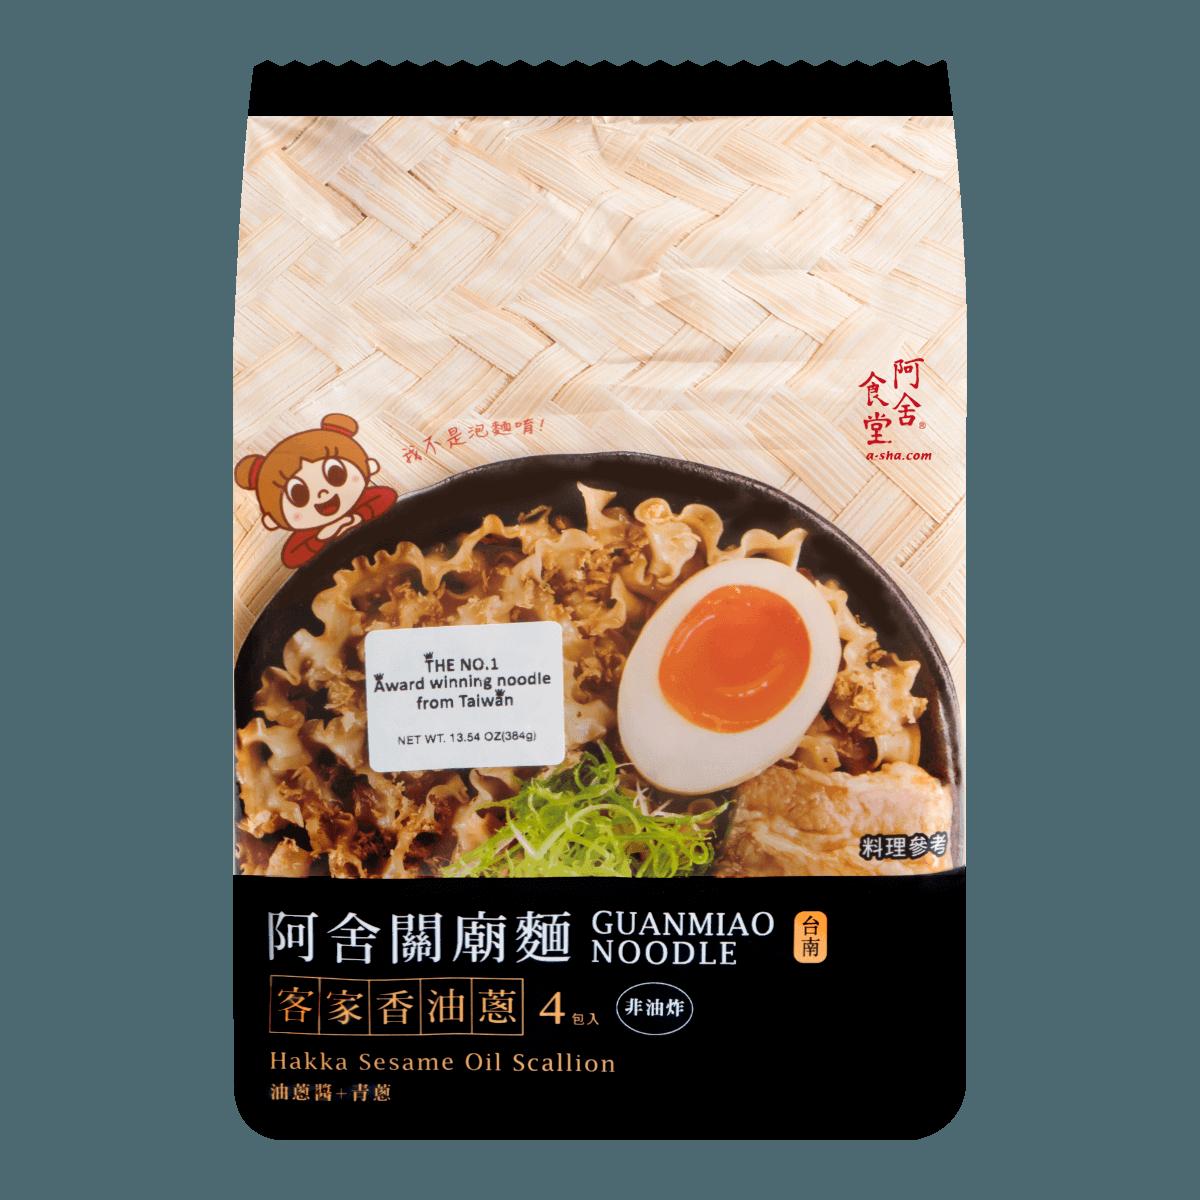 A-Sha Dry Noodle Guanmiao Noodle Hakka Sesame Oil Scallion 384g